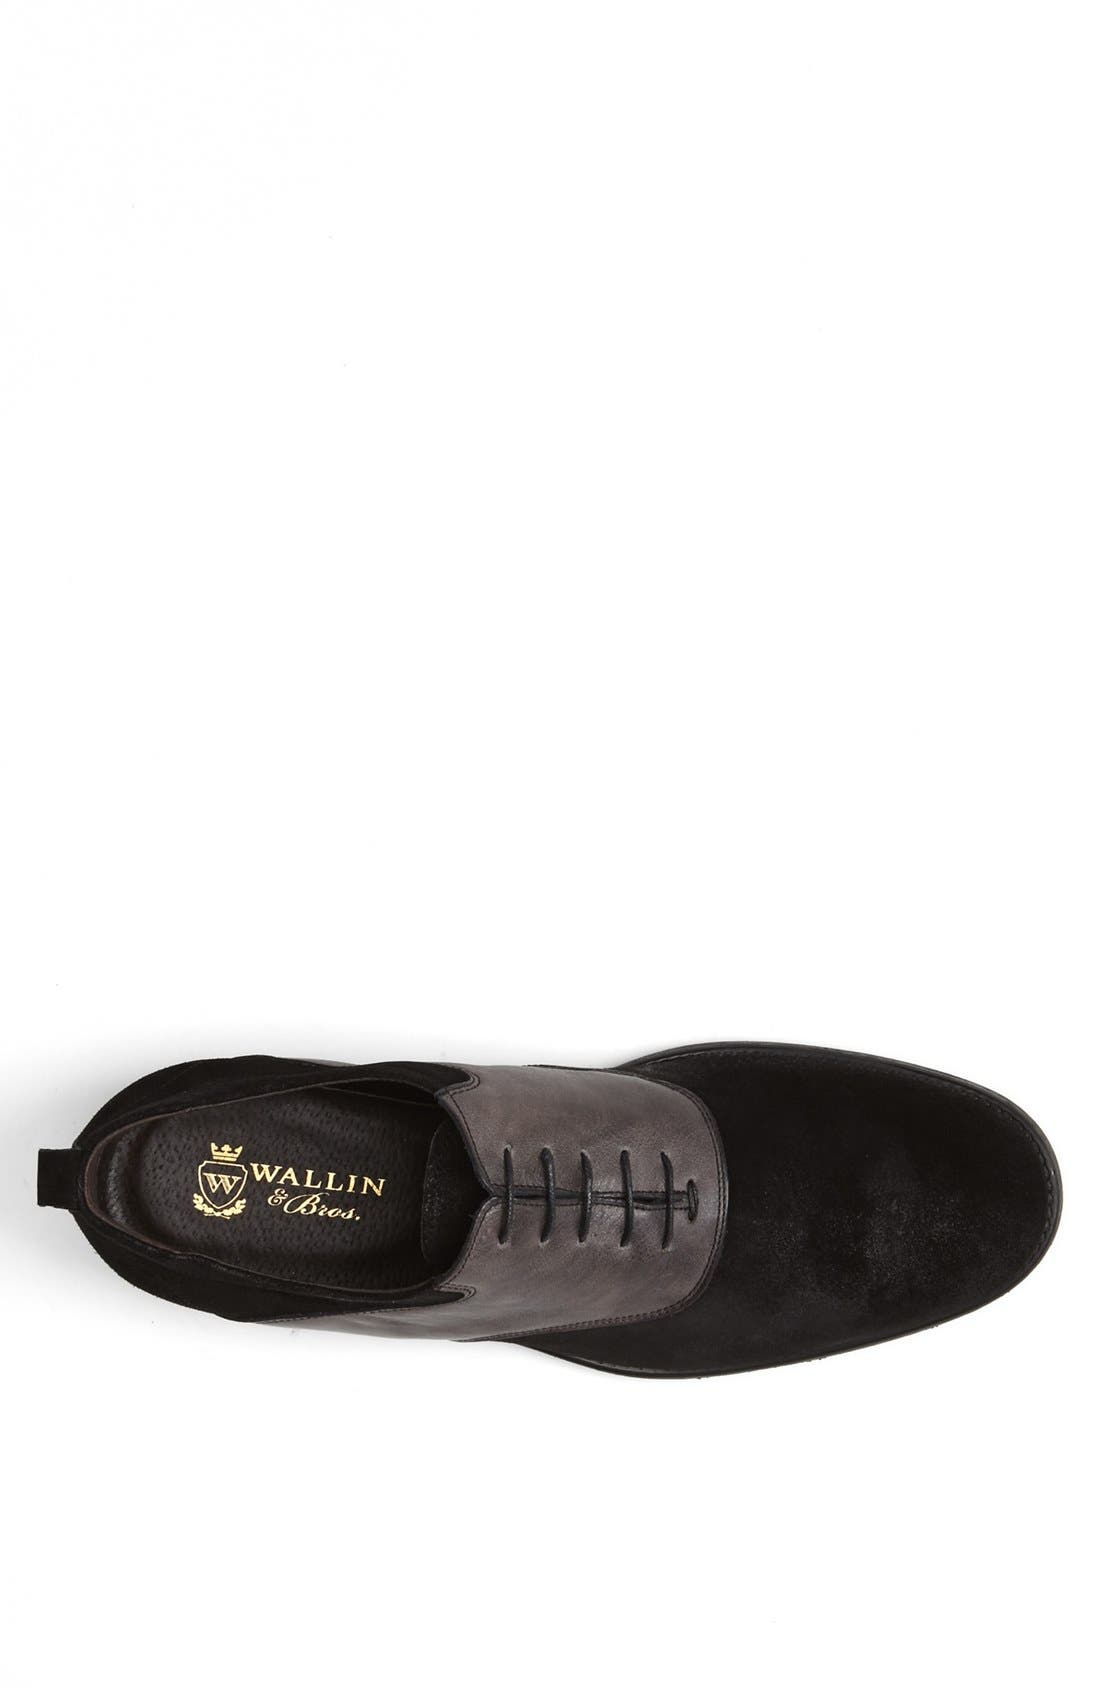 Alternate Image 3  - Wallin & Bros. 'Jacobs' Saddle Shoe